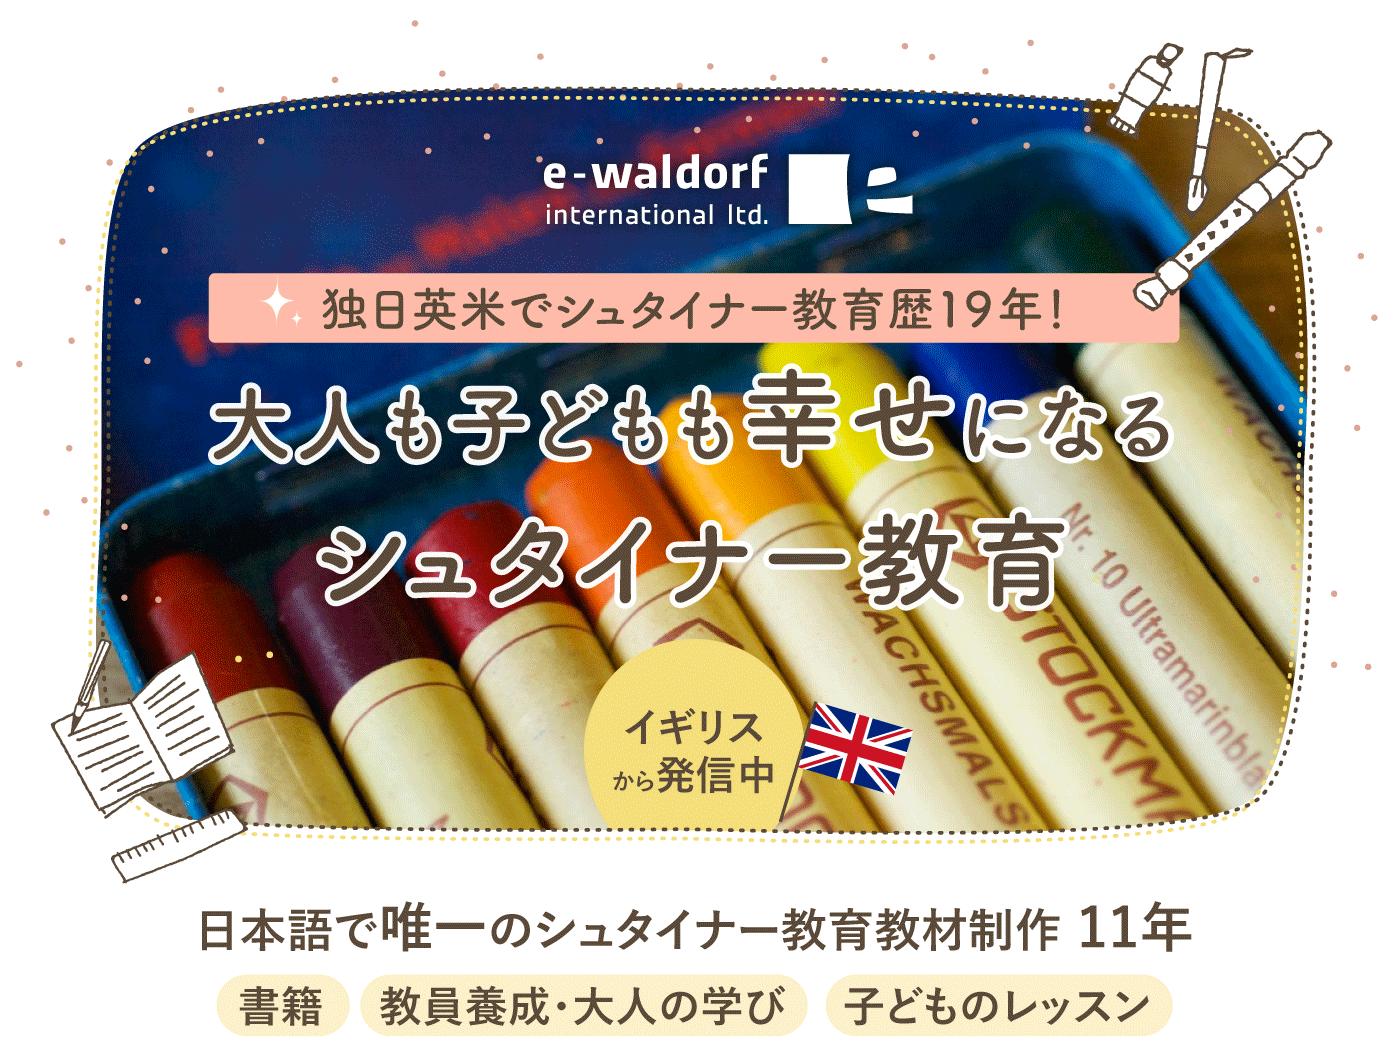 e-waldorf international ltd